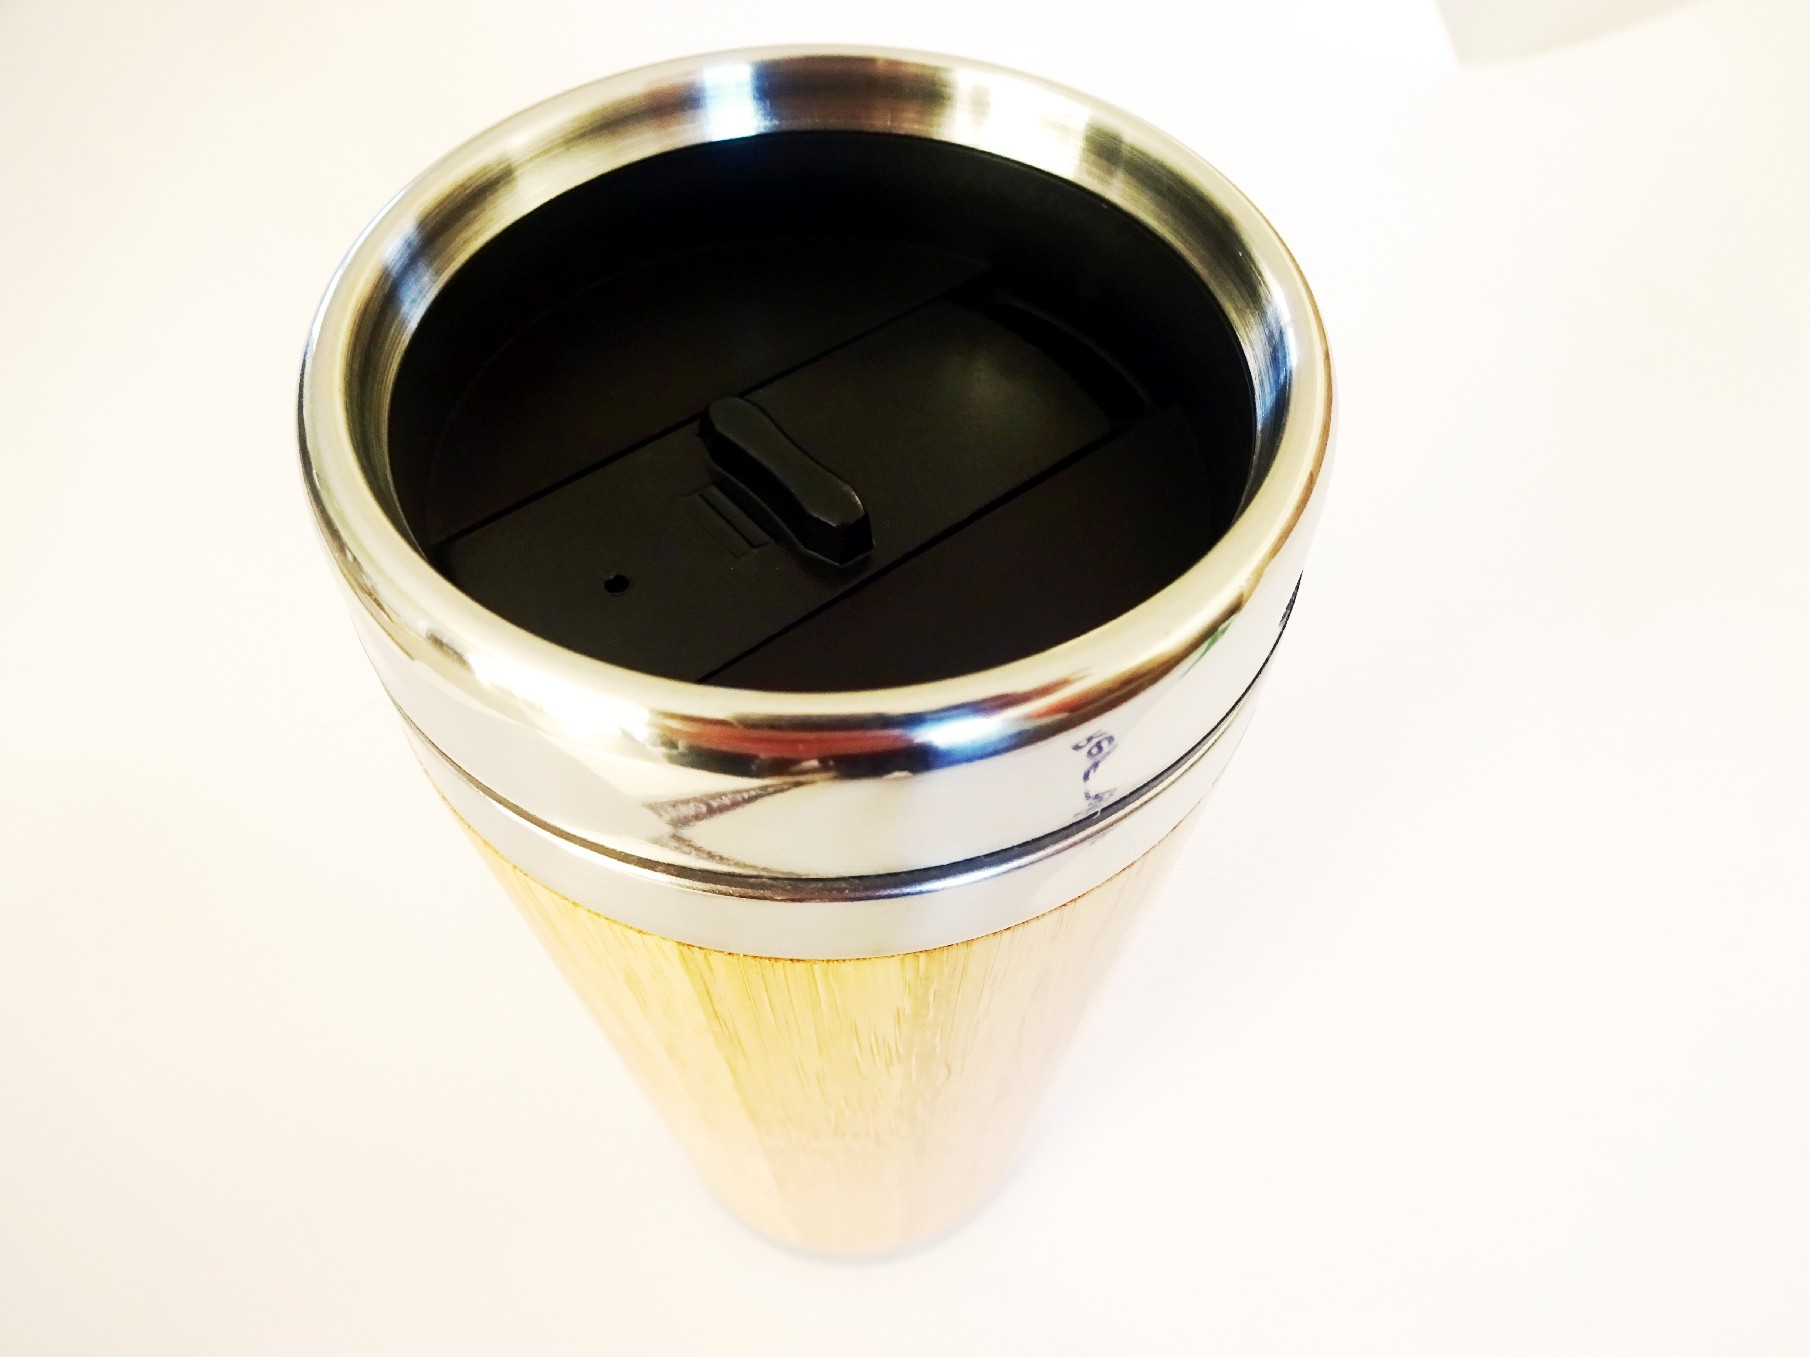 Drink you must - Wood Travel Mug with Lid BPA free